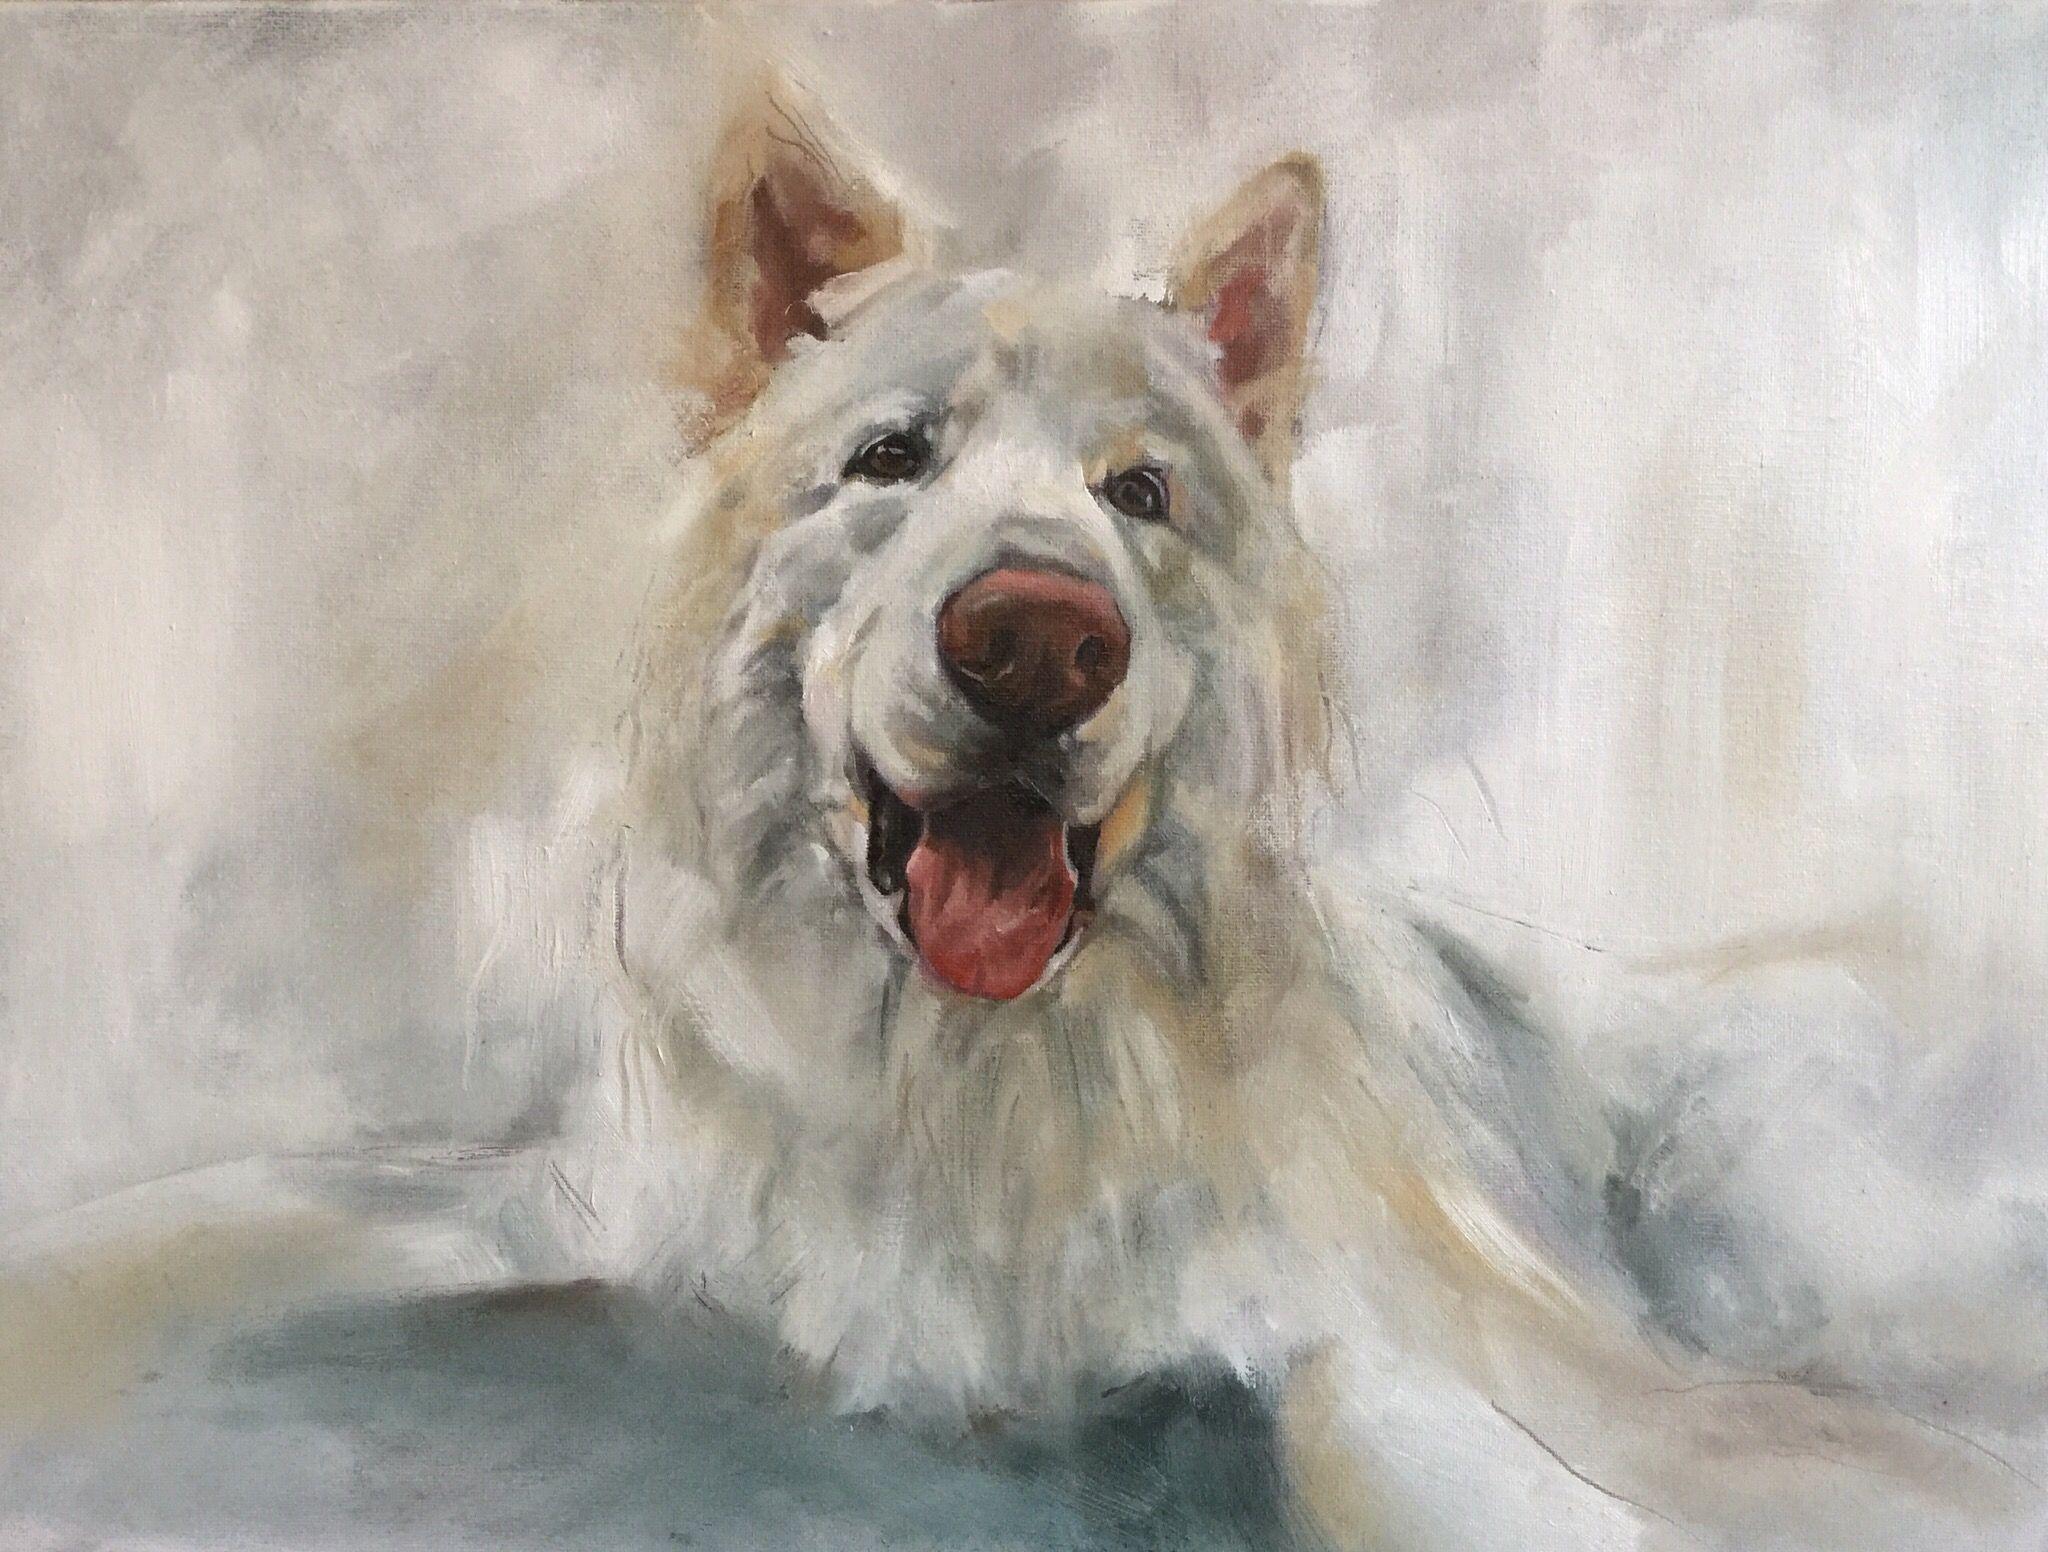 "'Apollo' 16""x12"" oil on canvas by Julie Brunn"